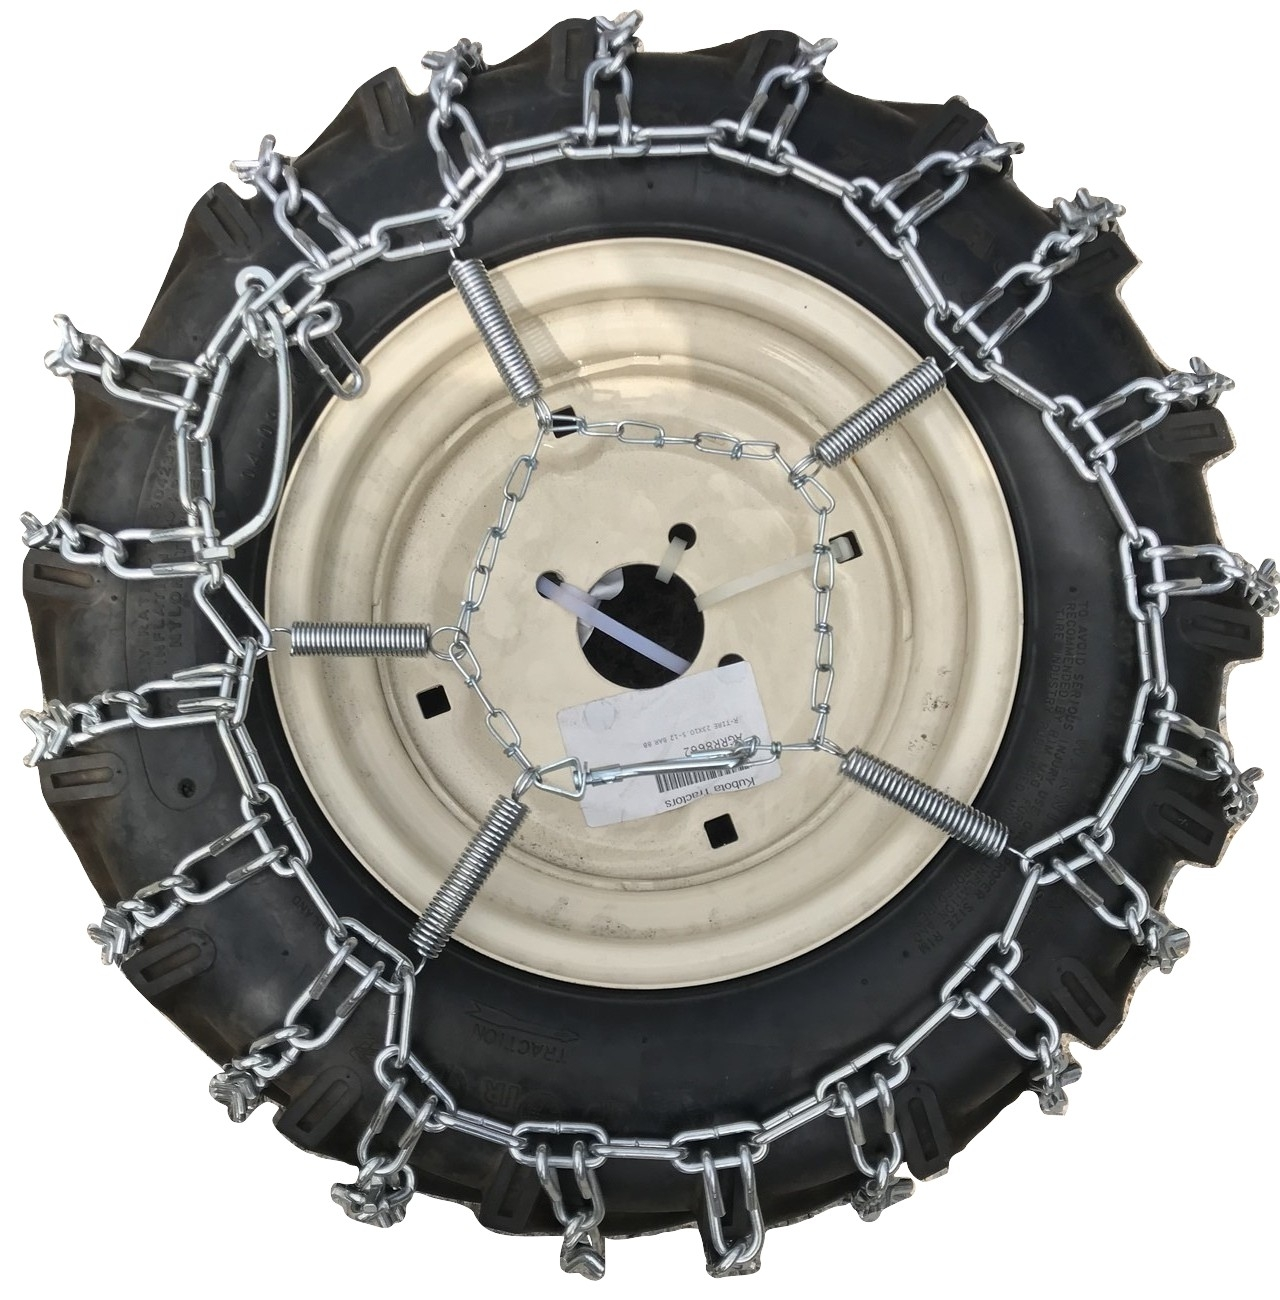 TireChain.com 23 X 7.50 X 12 23 7.50 12 Heavy Duty Tractor Tire Chains